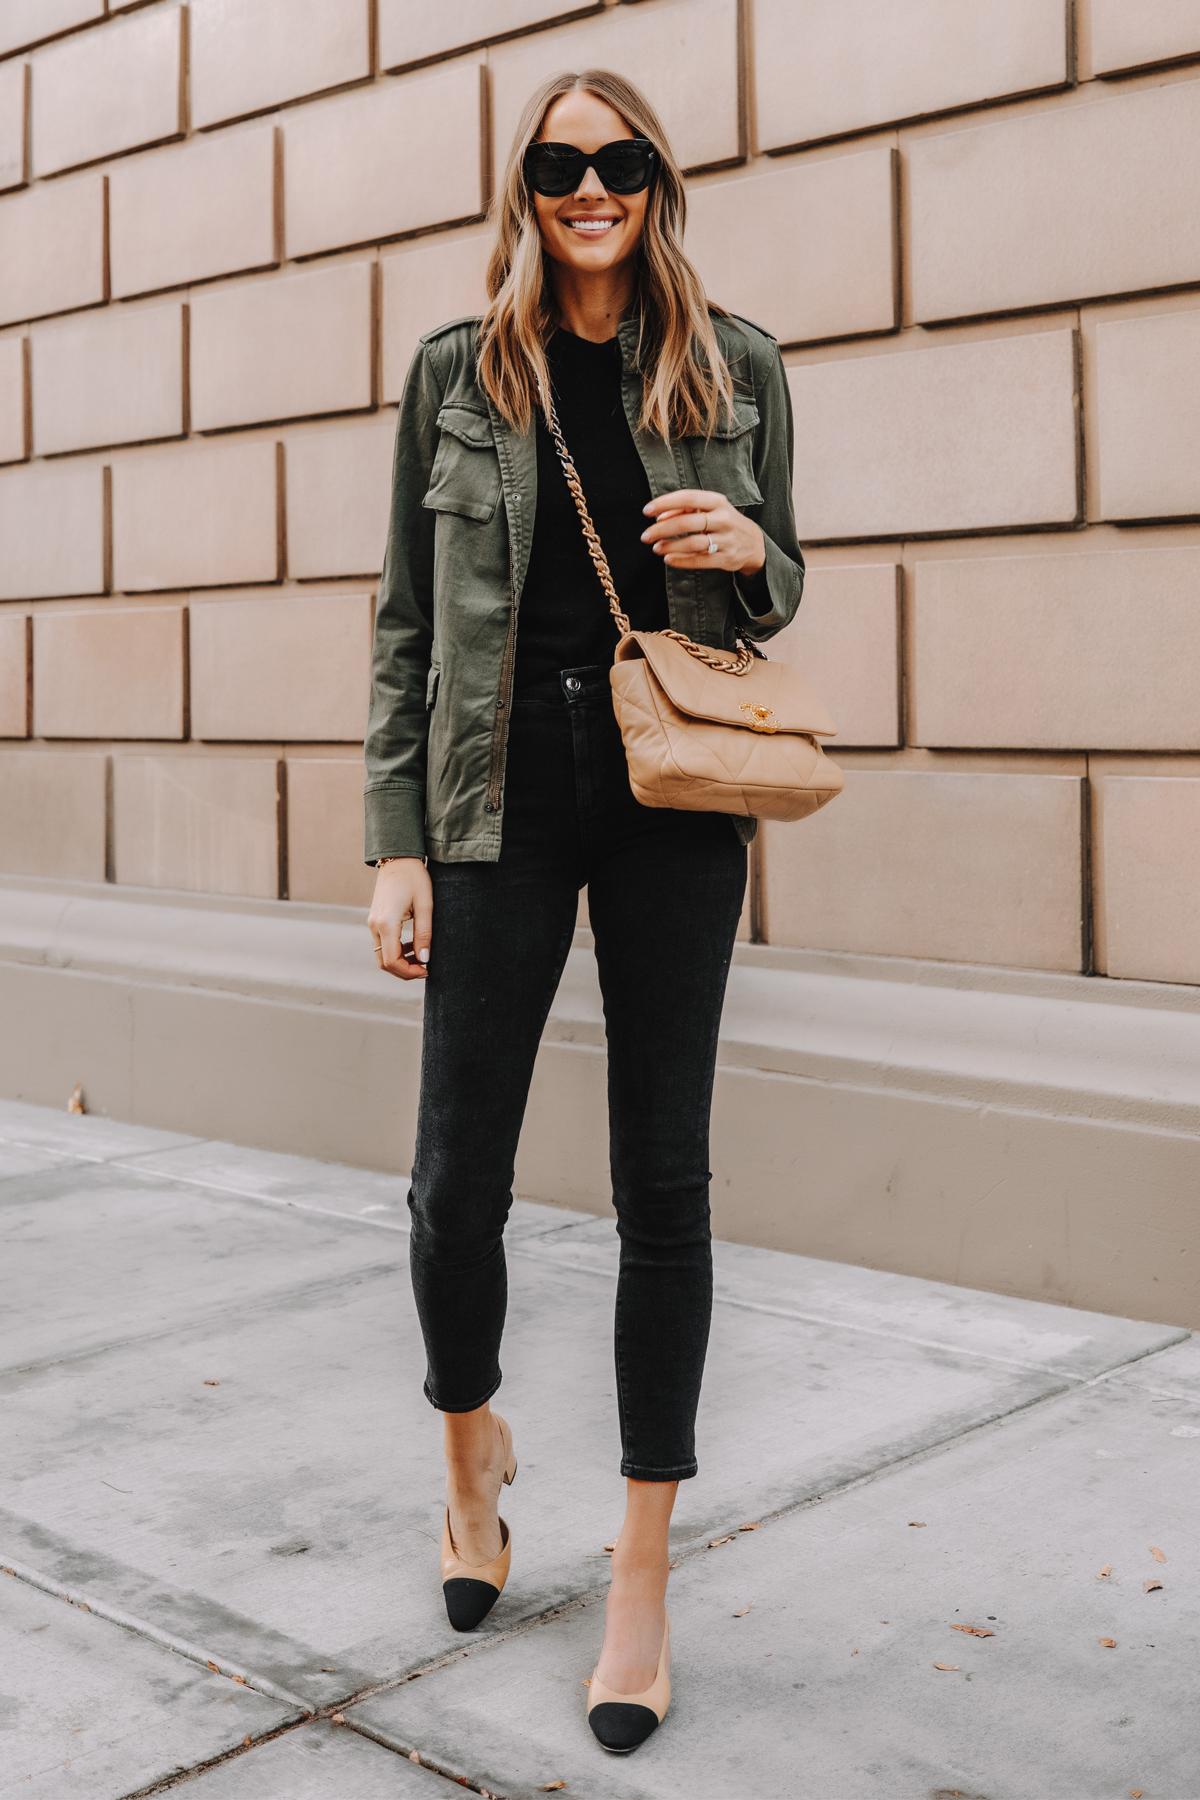 Fashion Jackson Wearing Anine Bing Green Utility Jacket Black Skinny Jeans Chanel Slingbacks Chanel 19 Small Dark Beige Handbag 1